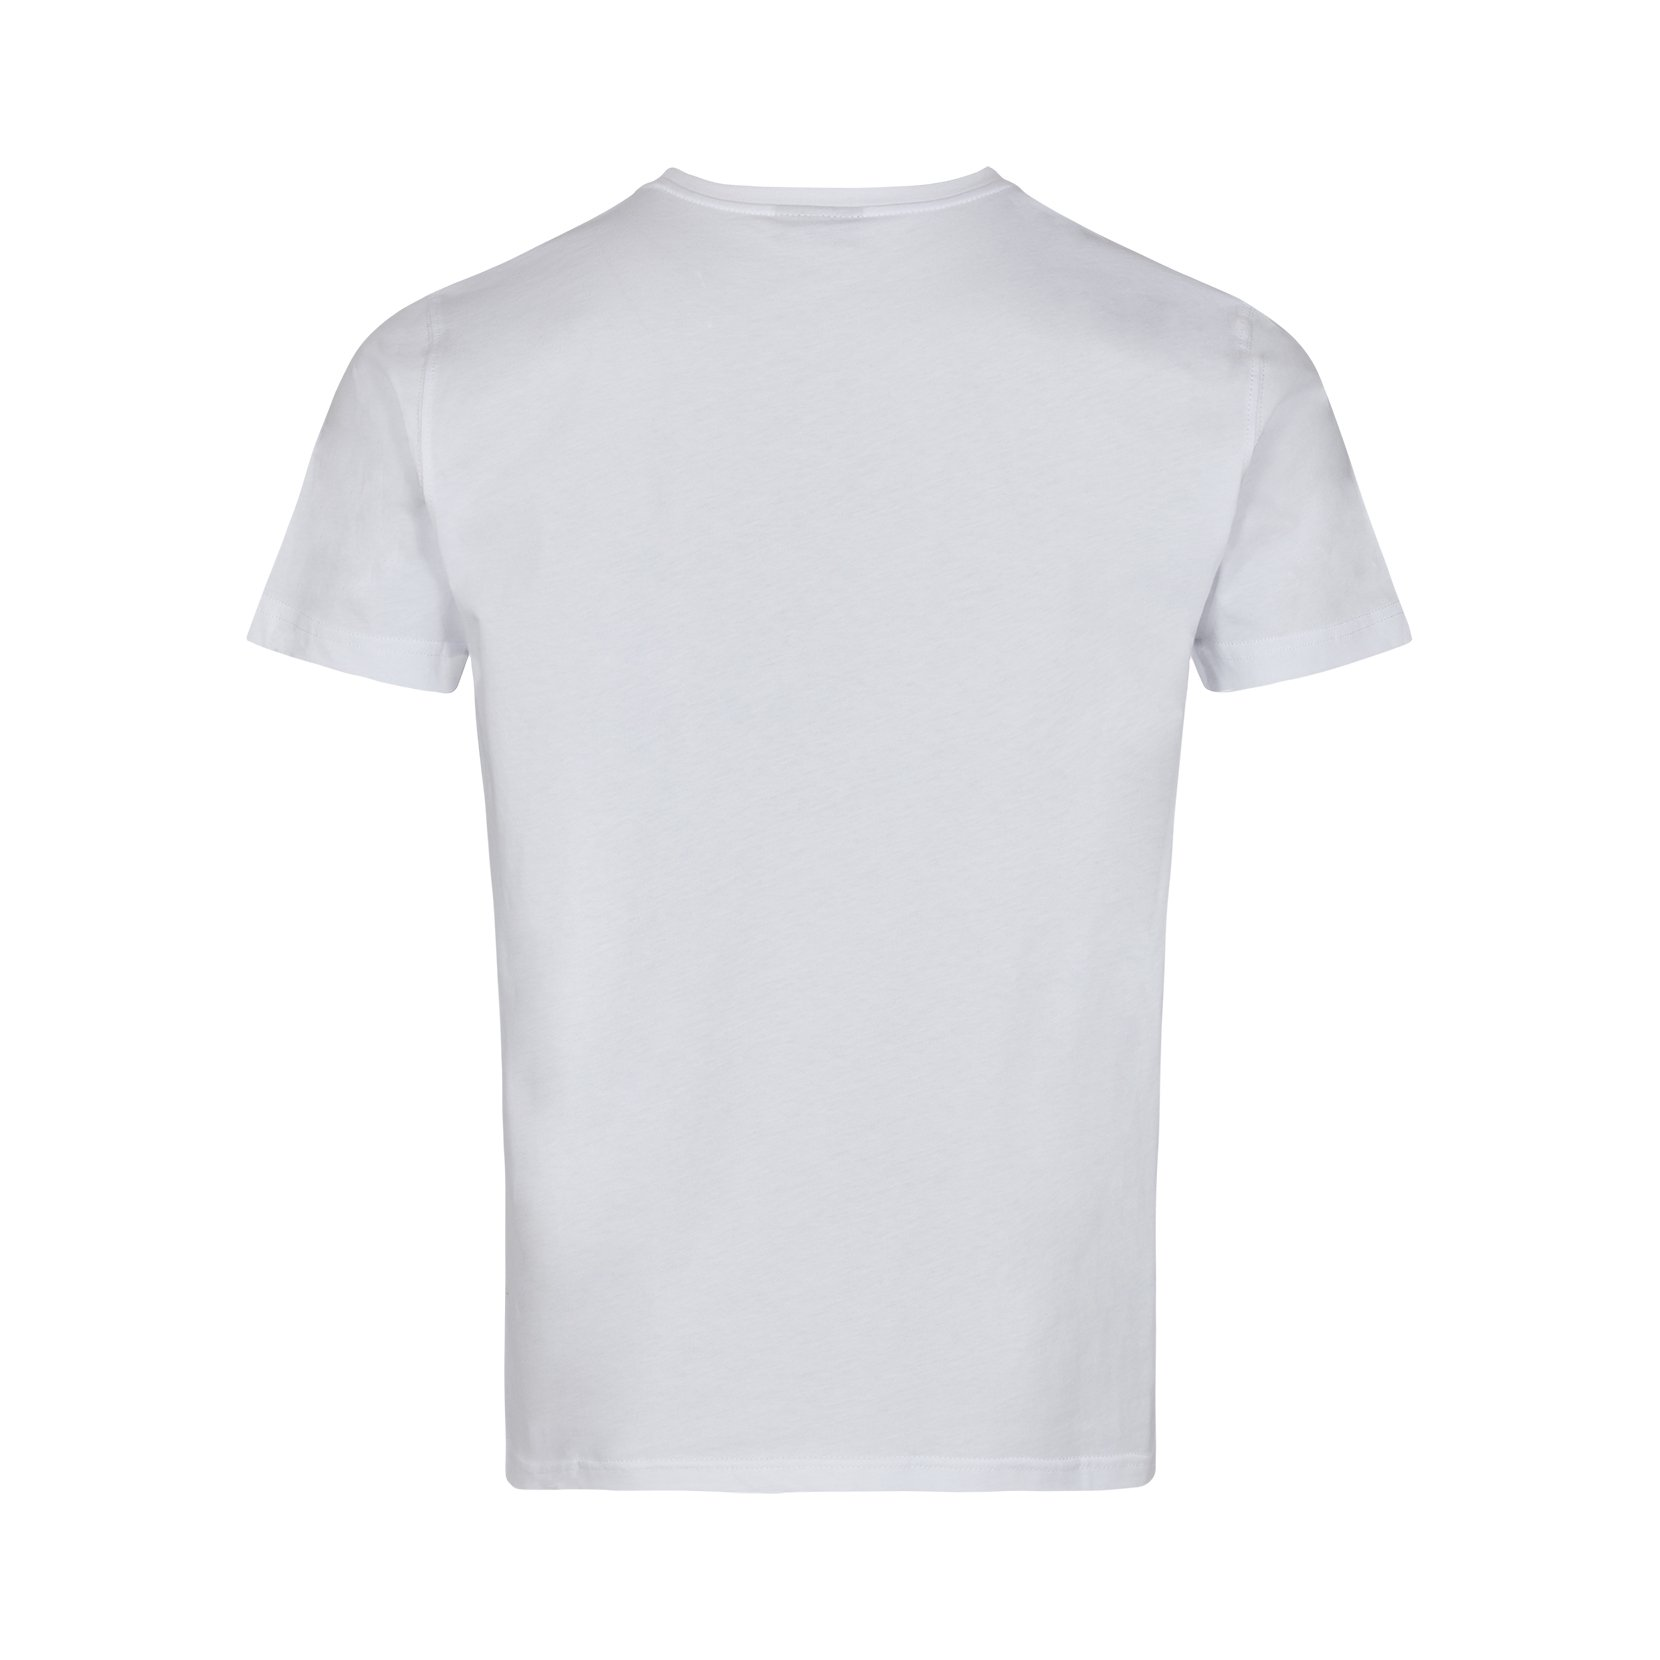 H2O Als t-shirt, white, small